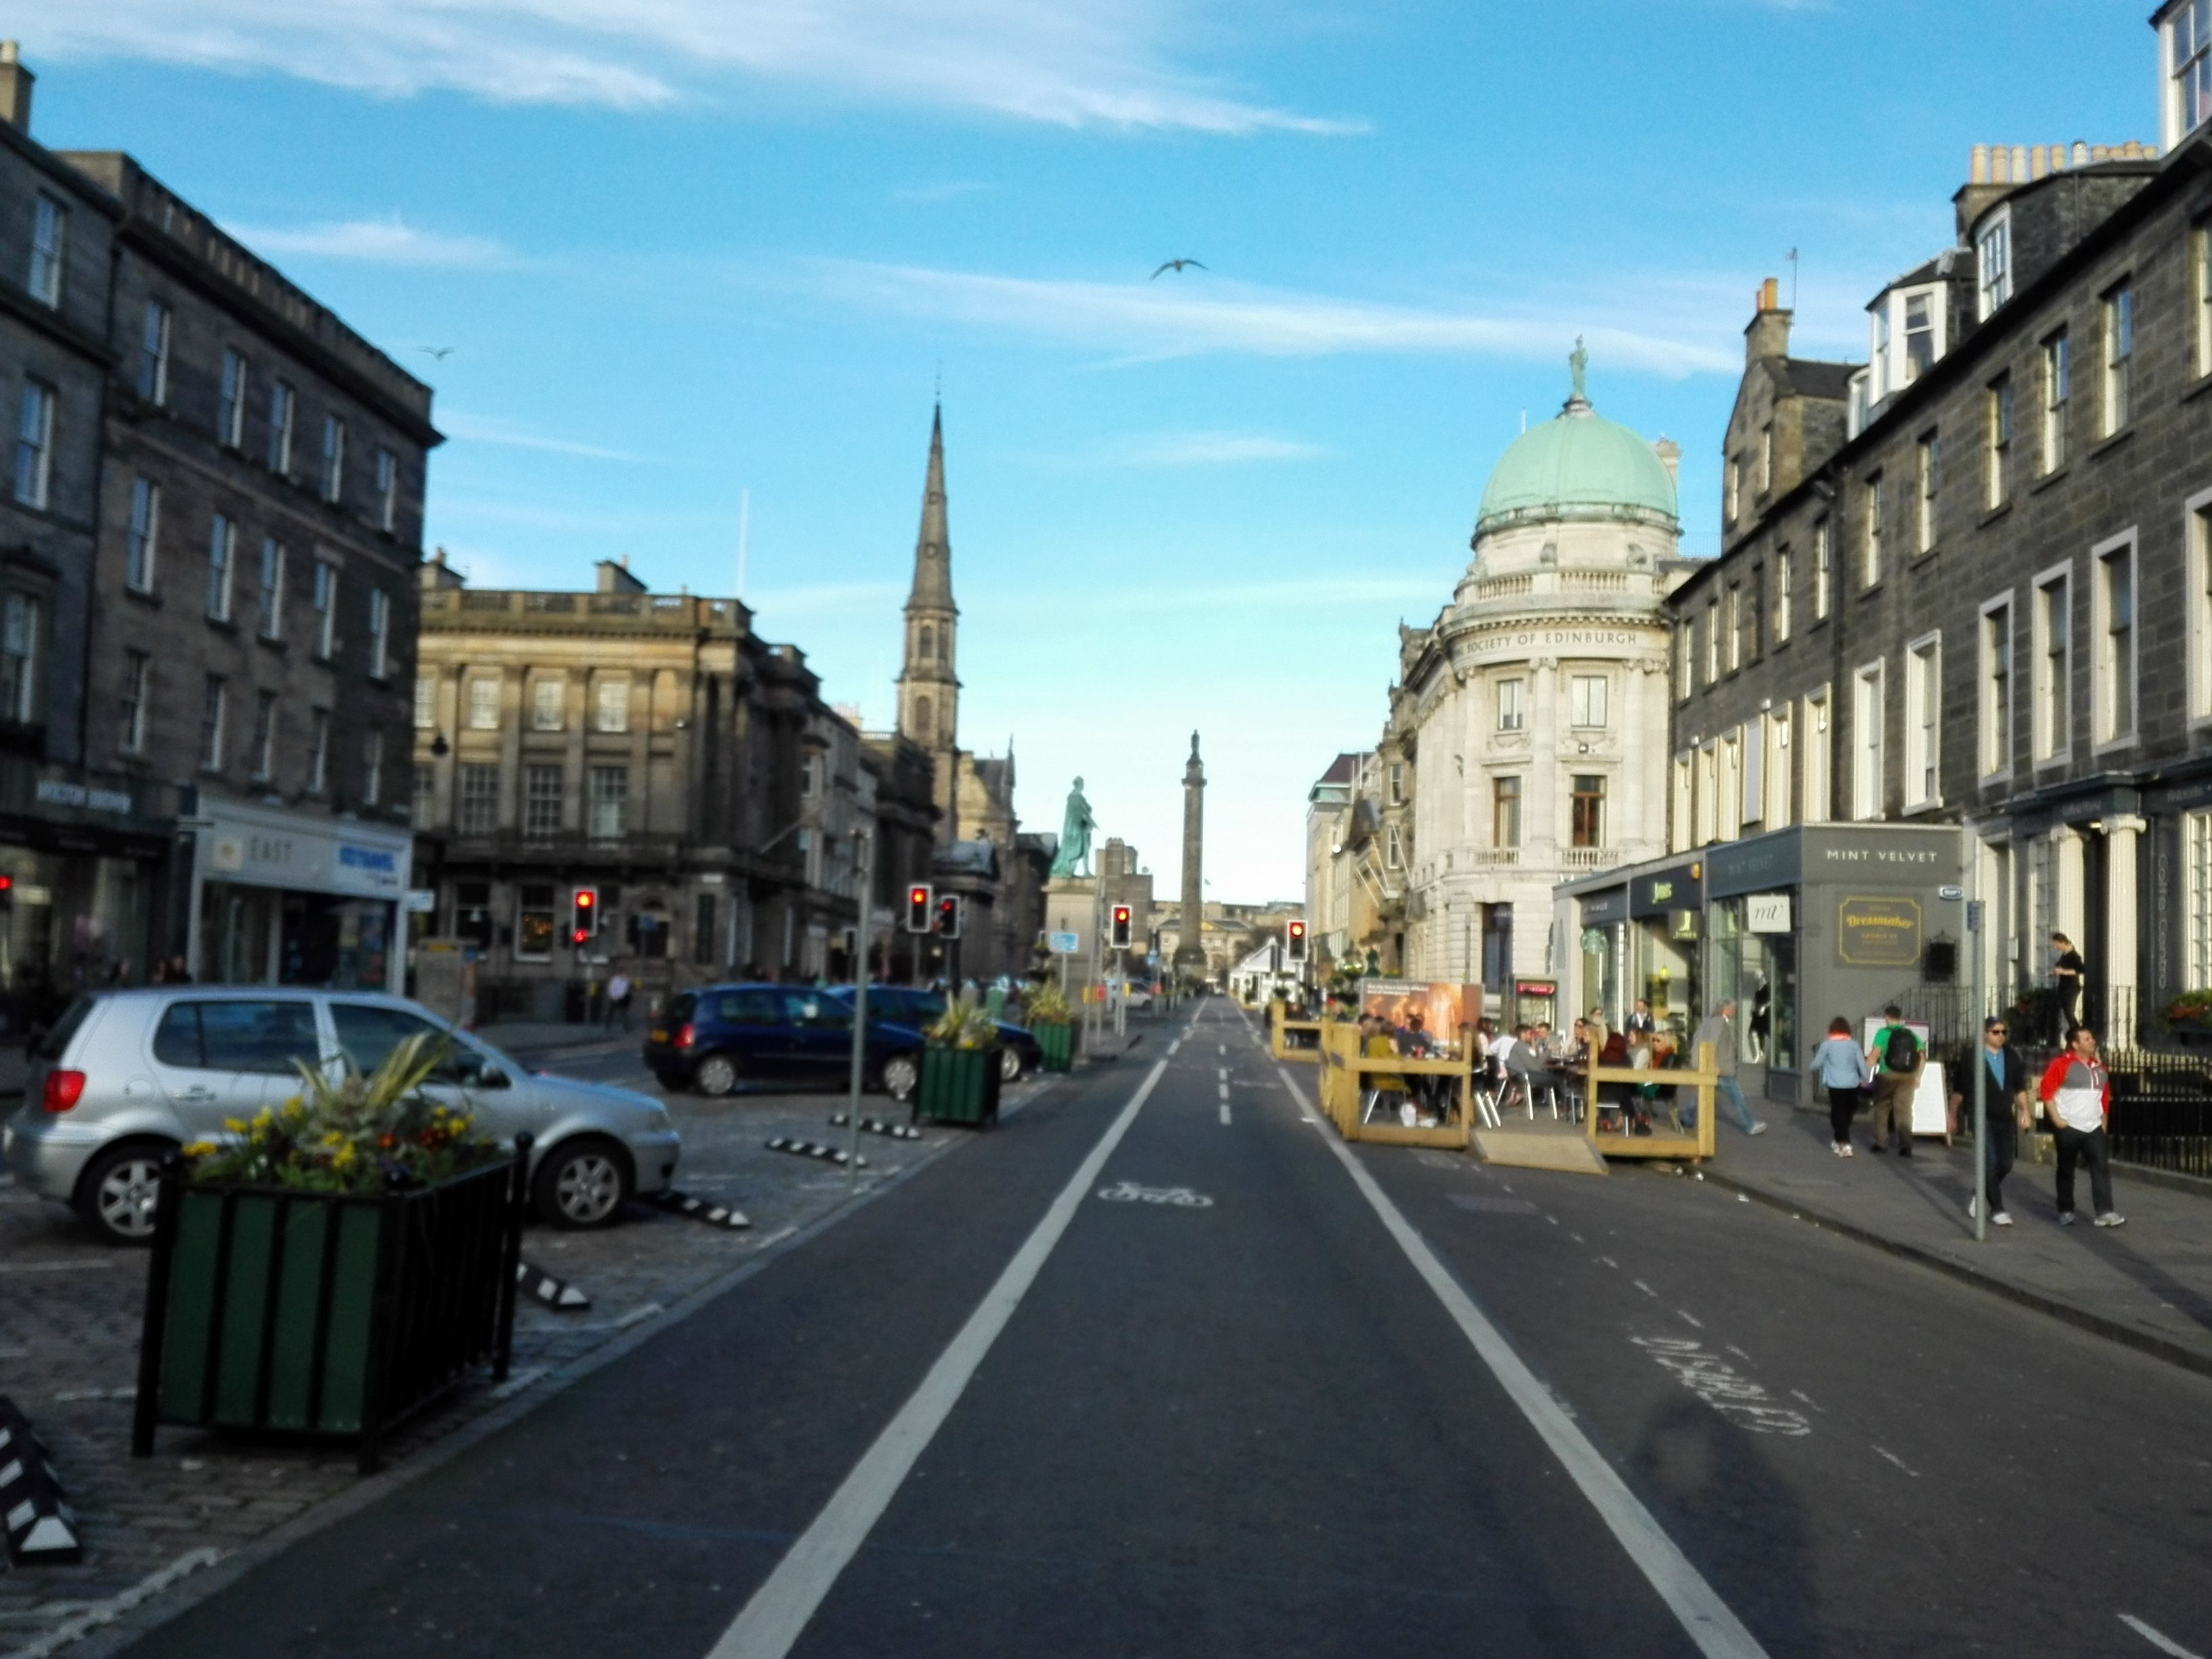 George Street. Edimburgo. #Edimburgo #Escocia #Edinburgh #Scotland ...